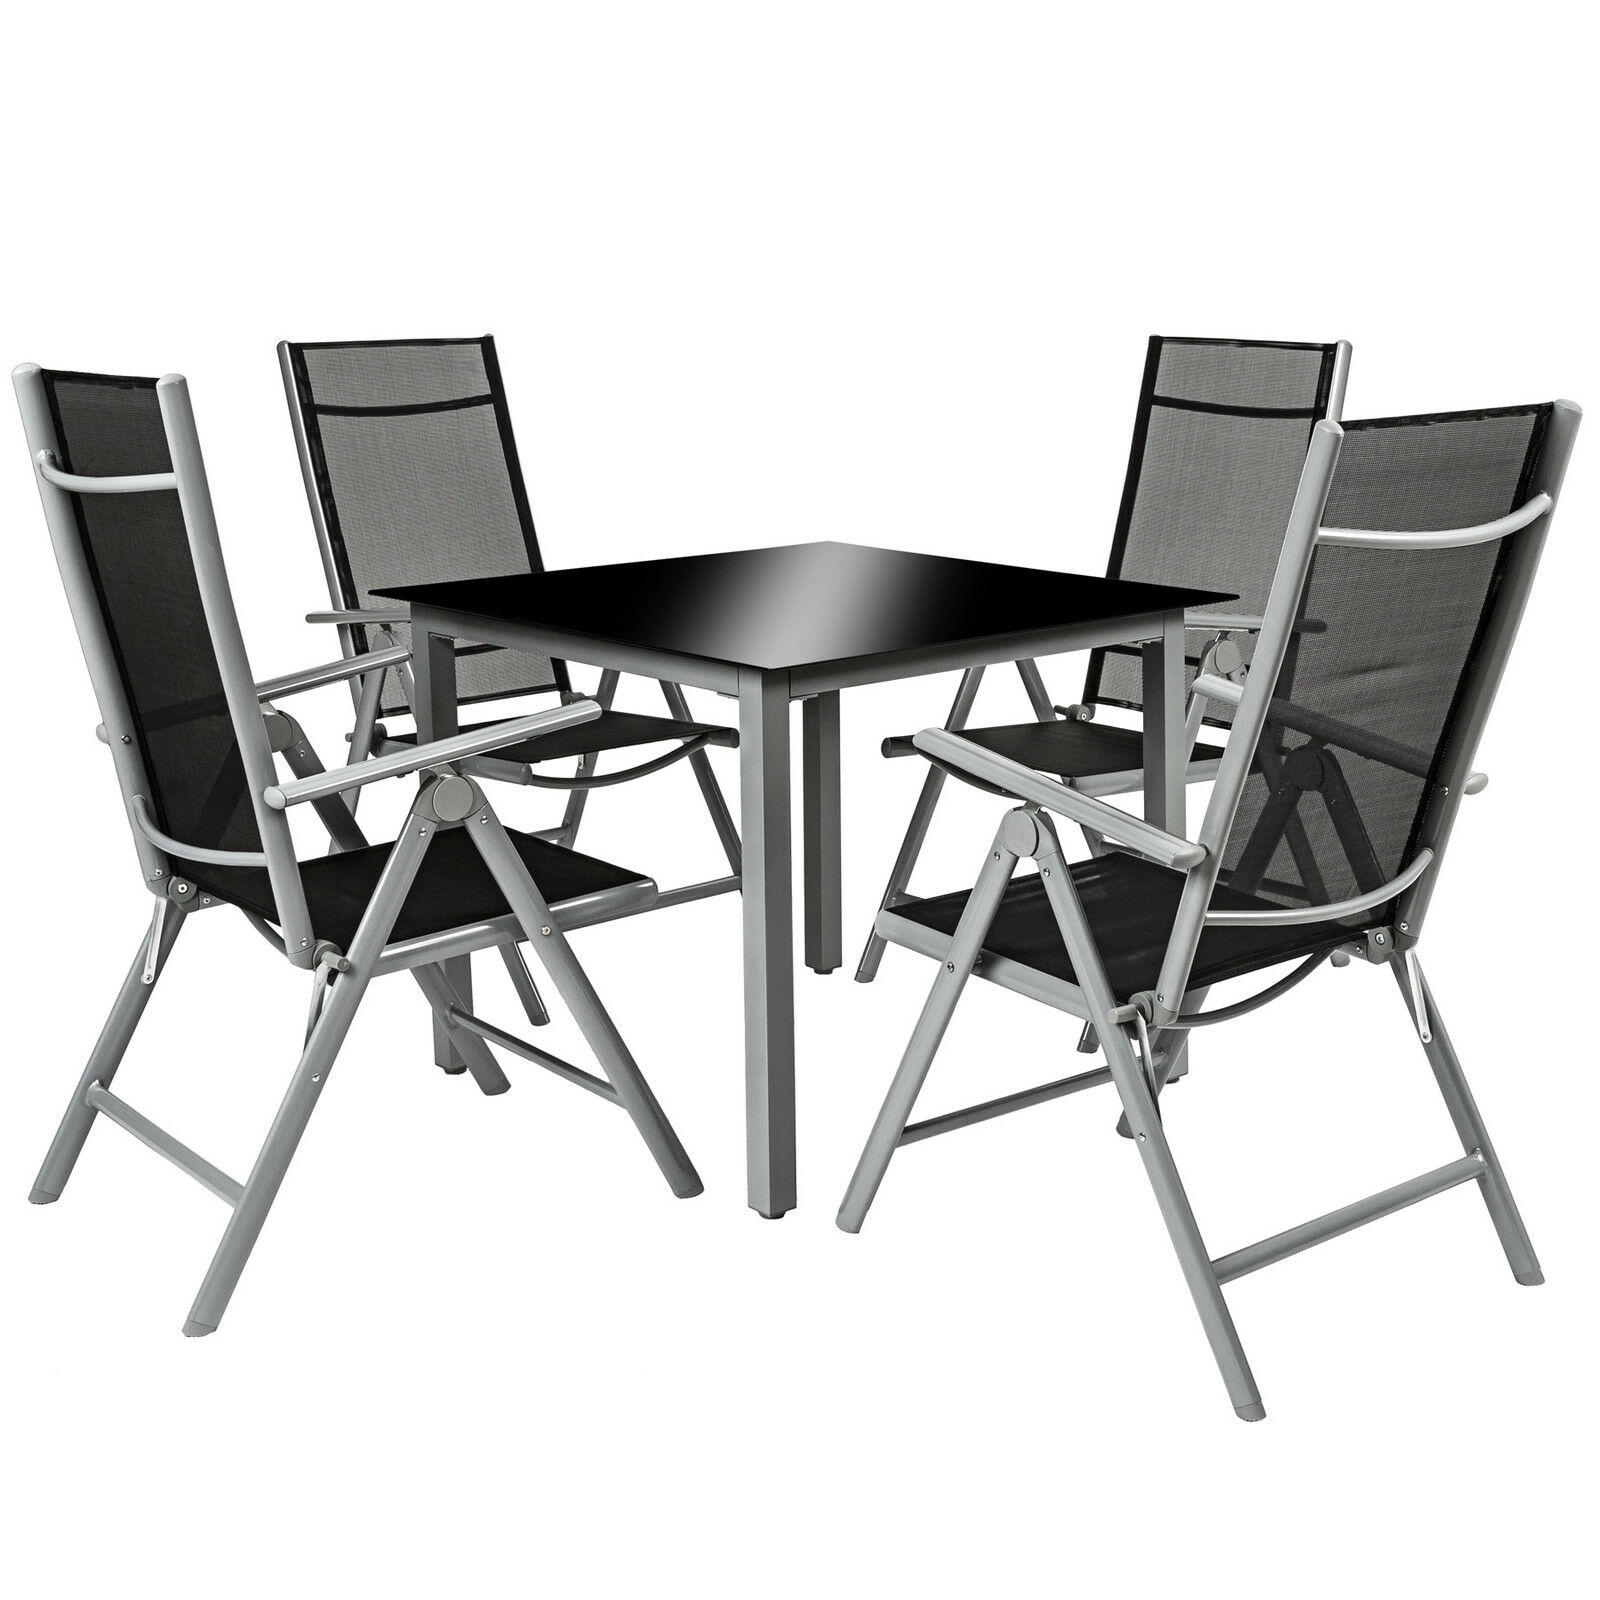 Aluminio conjunto muebles de jardin 4 1 silla adjustable for Muebles de aluminio para jardin